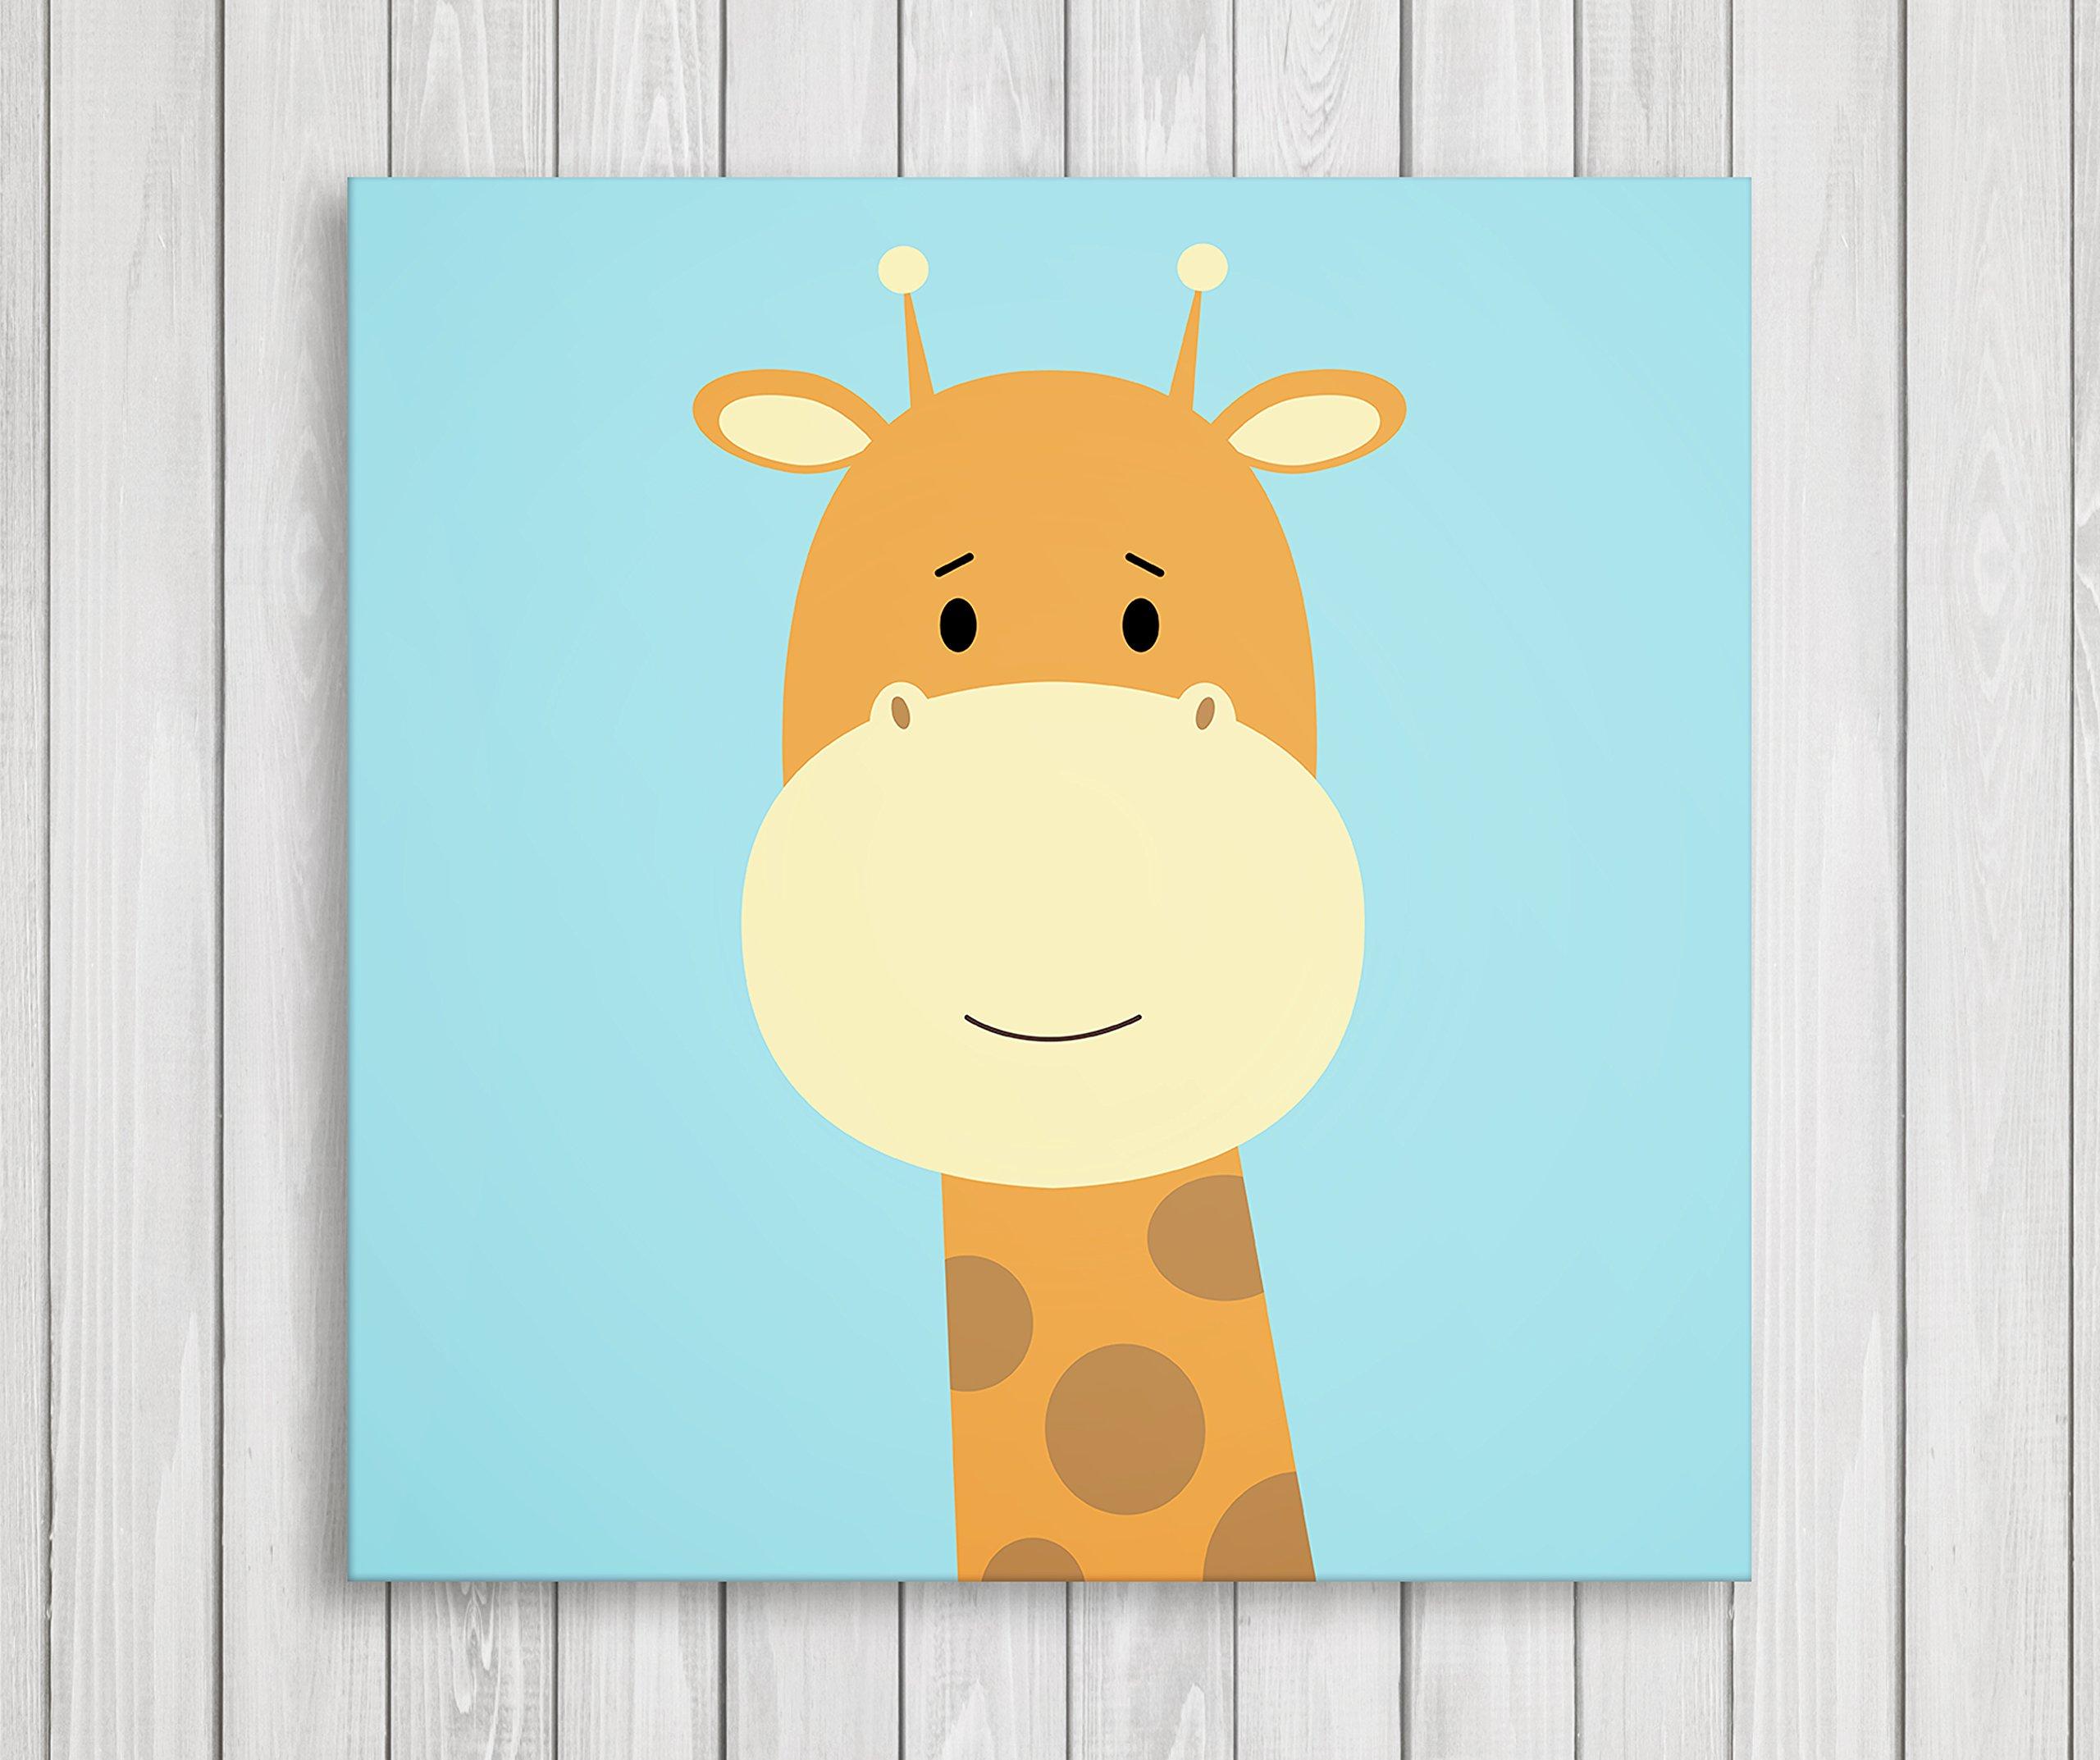 Cute Little Animals Nursery Wall Decor, Baby Room Canvas Art (11'' W x 11'' H, Giraffe)